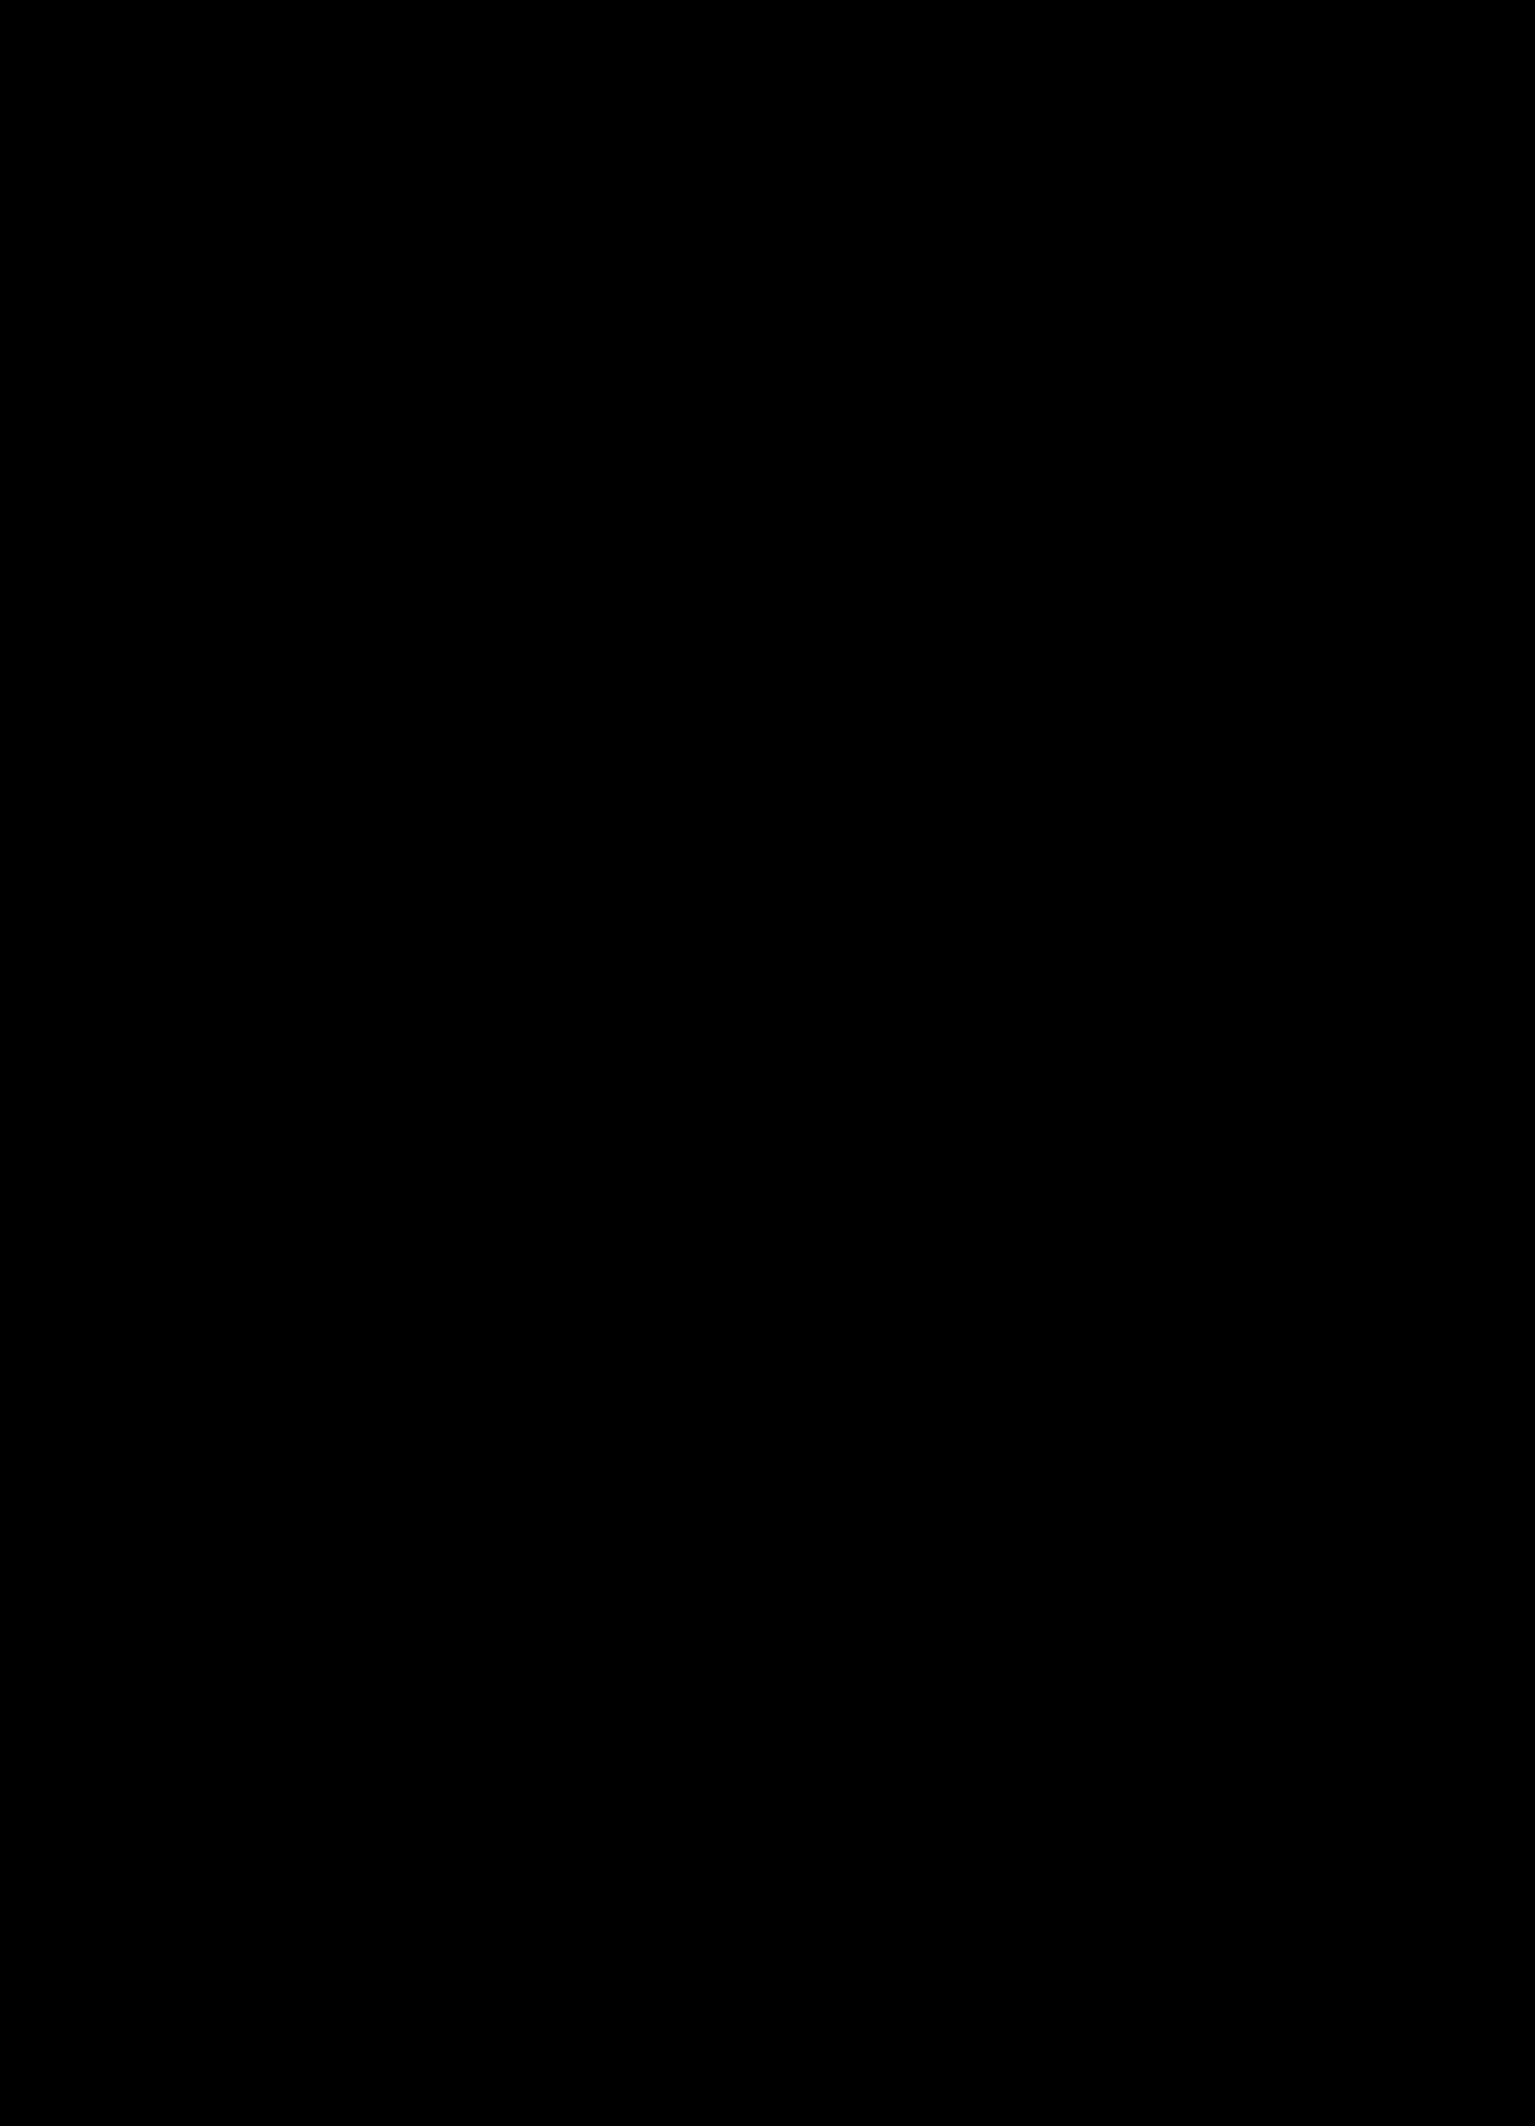 Fauteuil aus dem 19. Jahrhundert